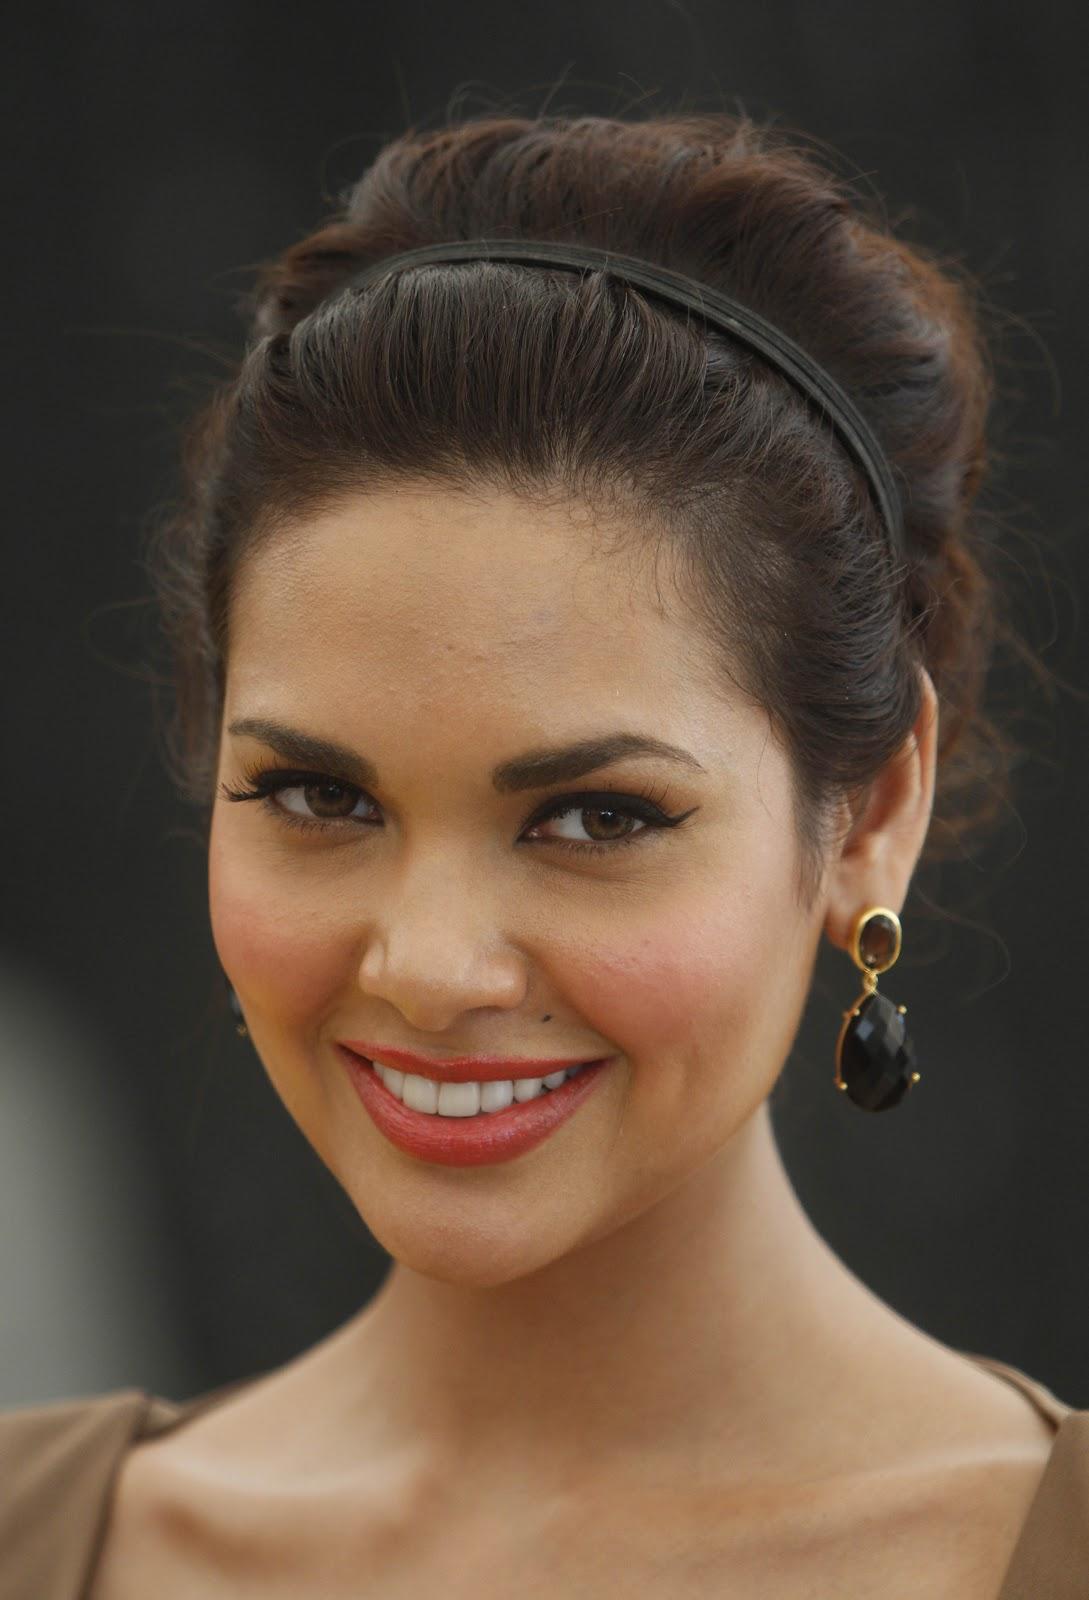 High Quality Bollywood Celebrity Pictures Esha Gupta -2305